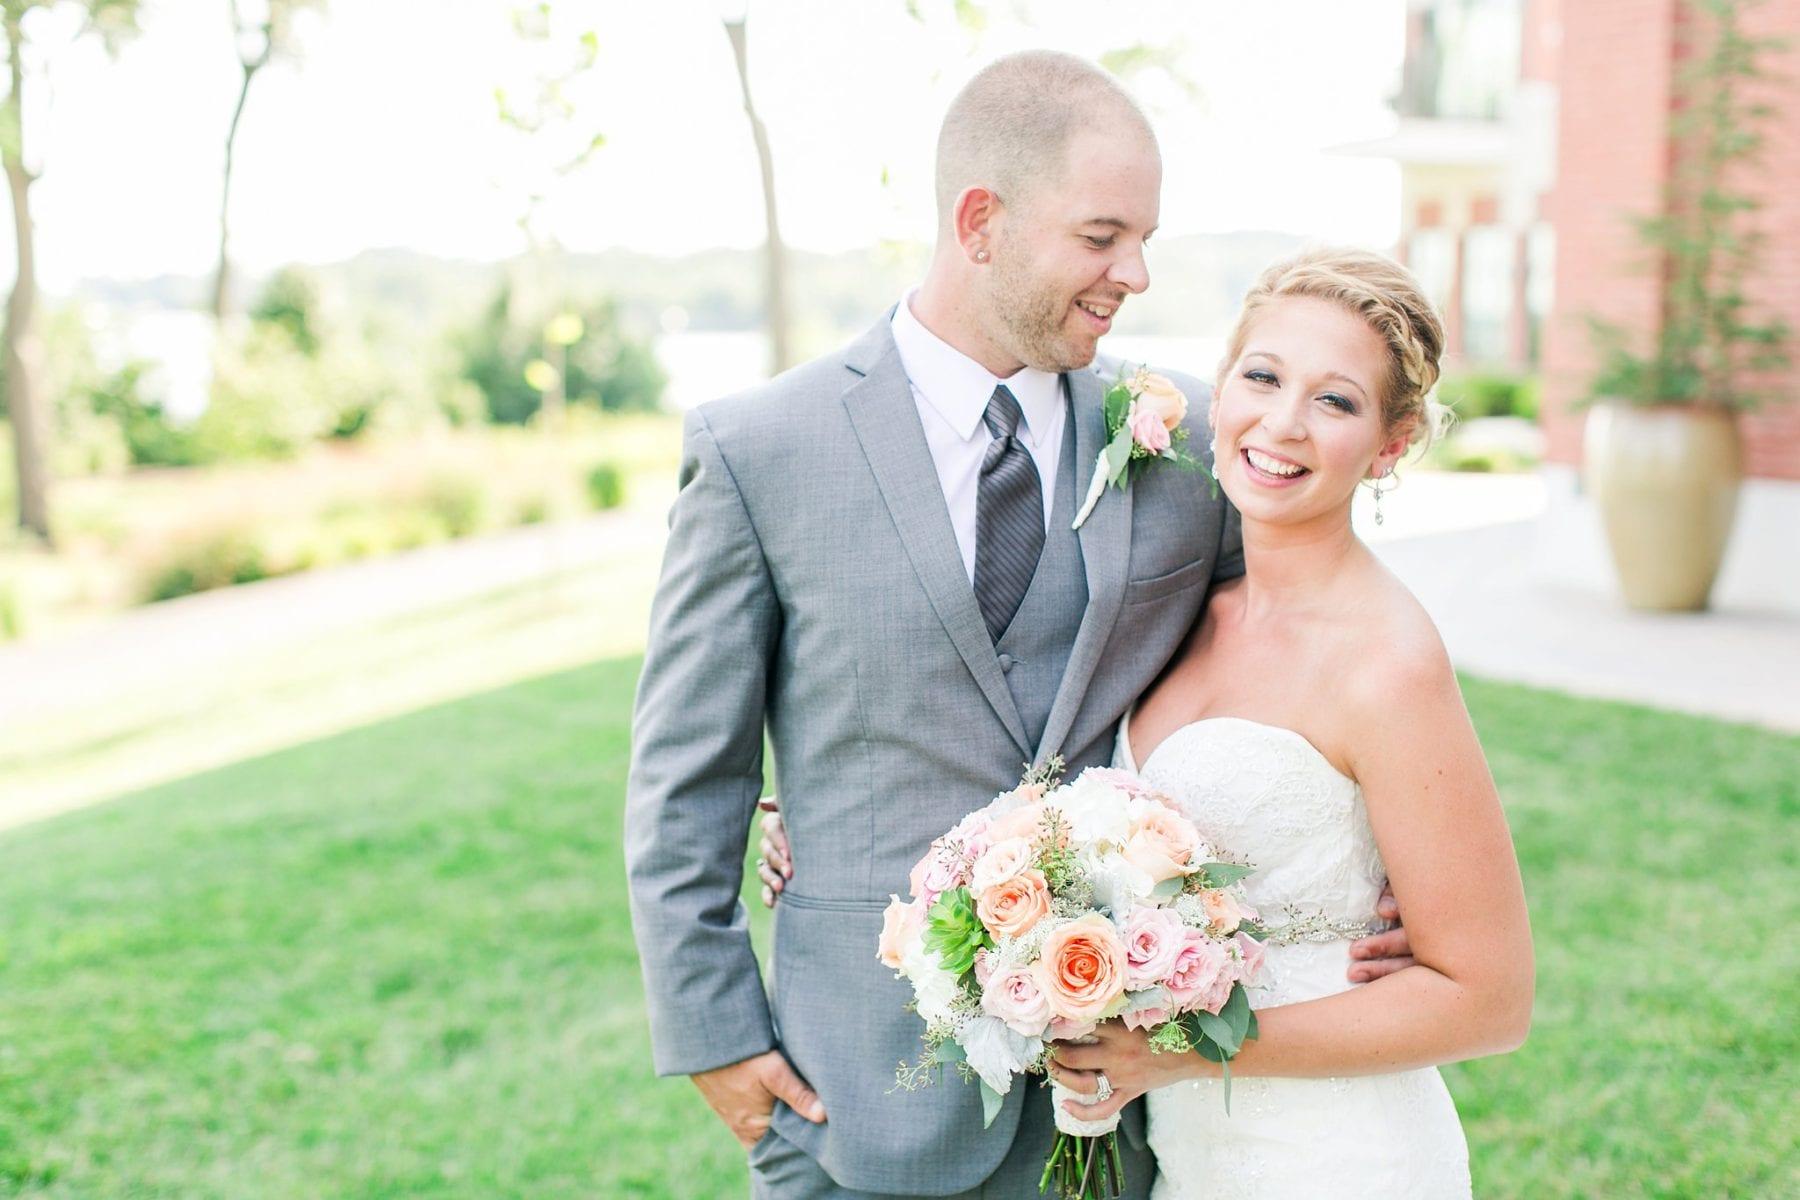 Waters Edge Wedding Photos Maryland Wedding Photographer Megan Kelsey Photography Katie & Conor-341.JPG